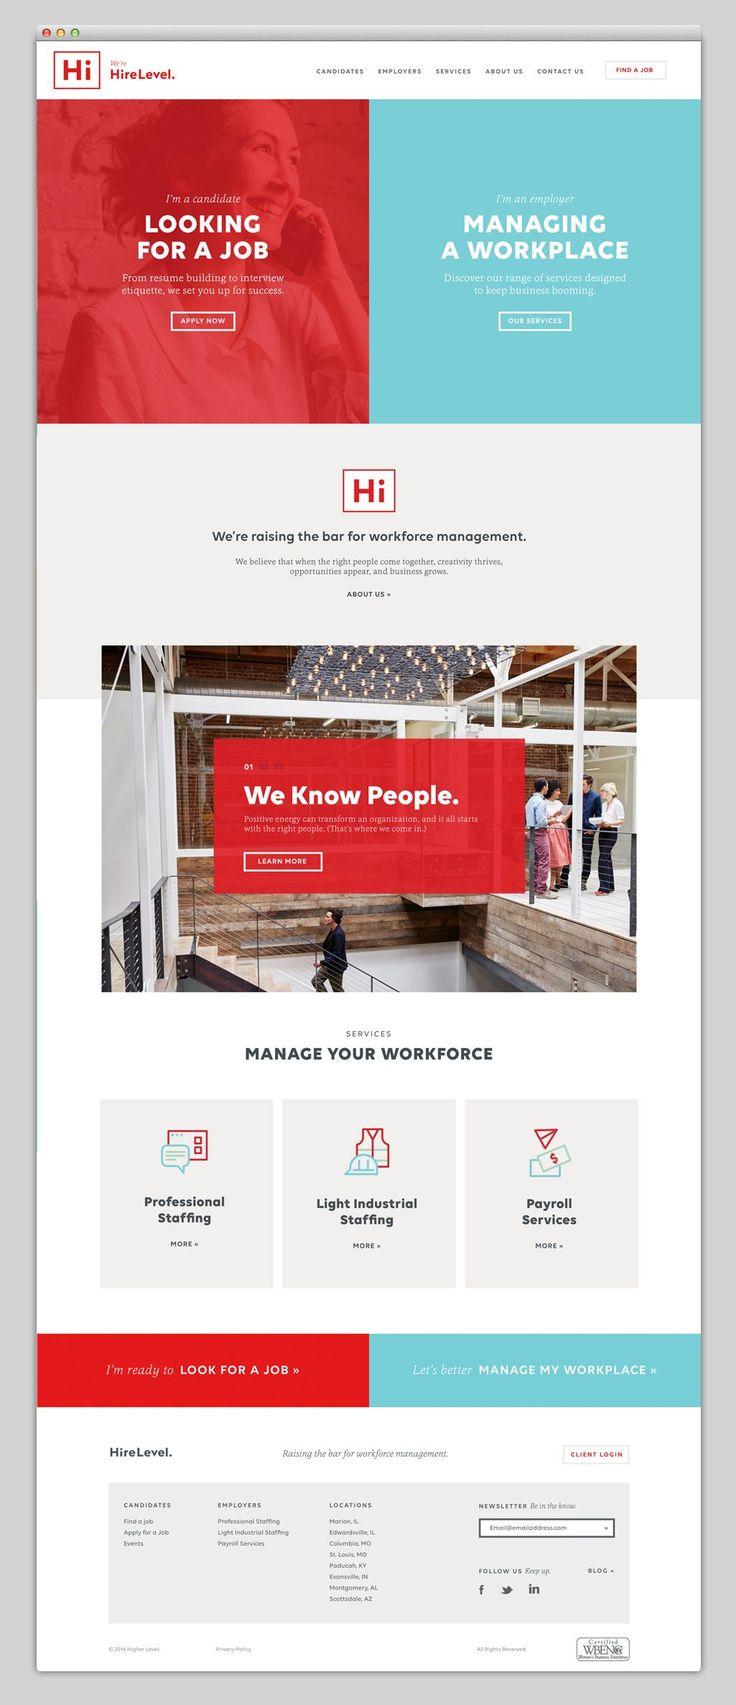 Layout photoshop web design website template tutorials tutorial 022 - Websites We Love Showcasing The Best In Web Design